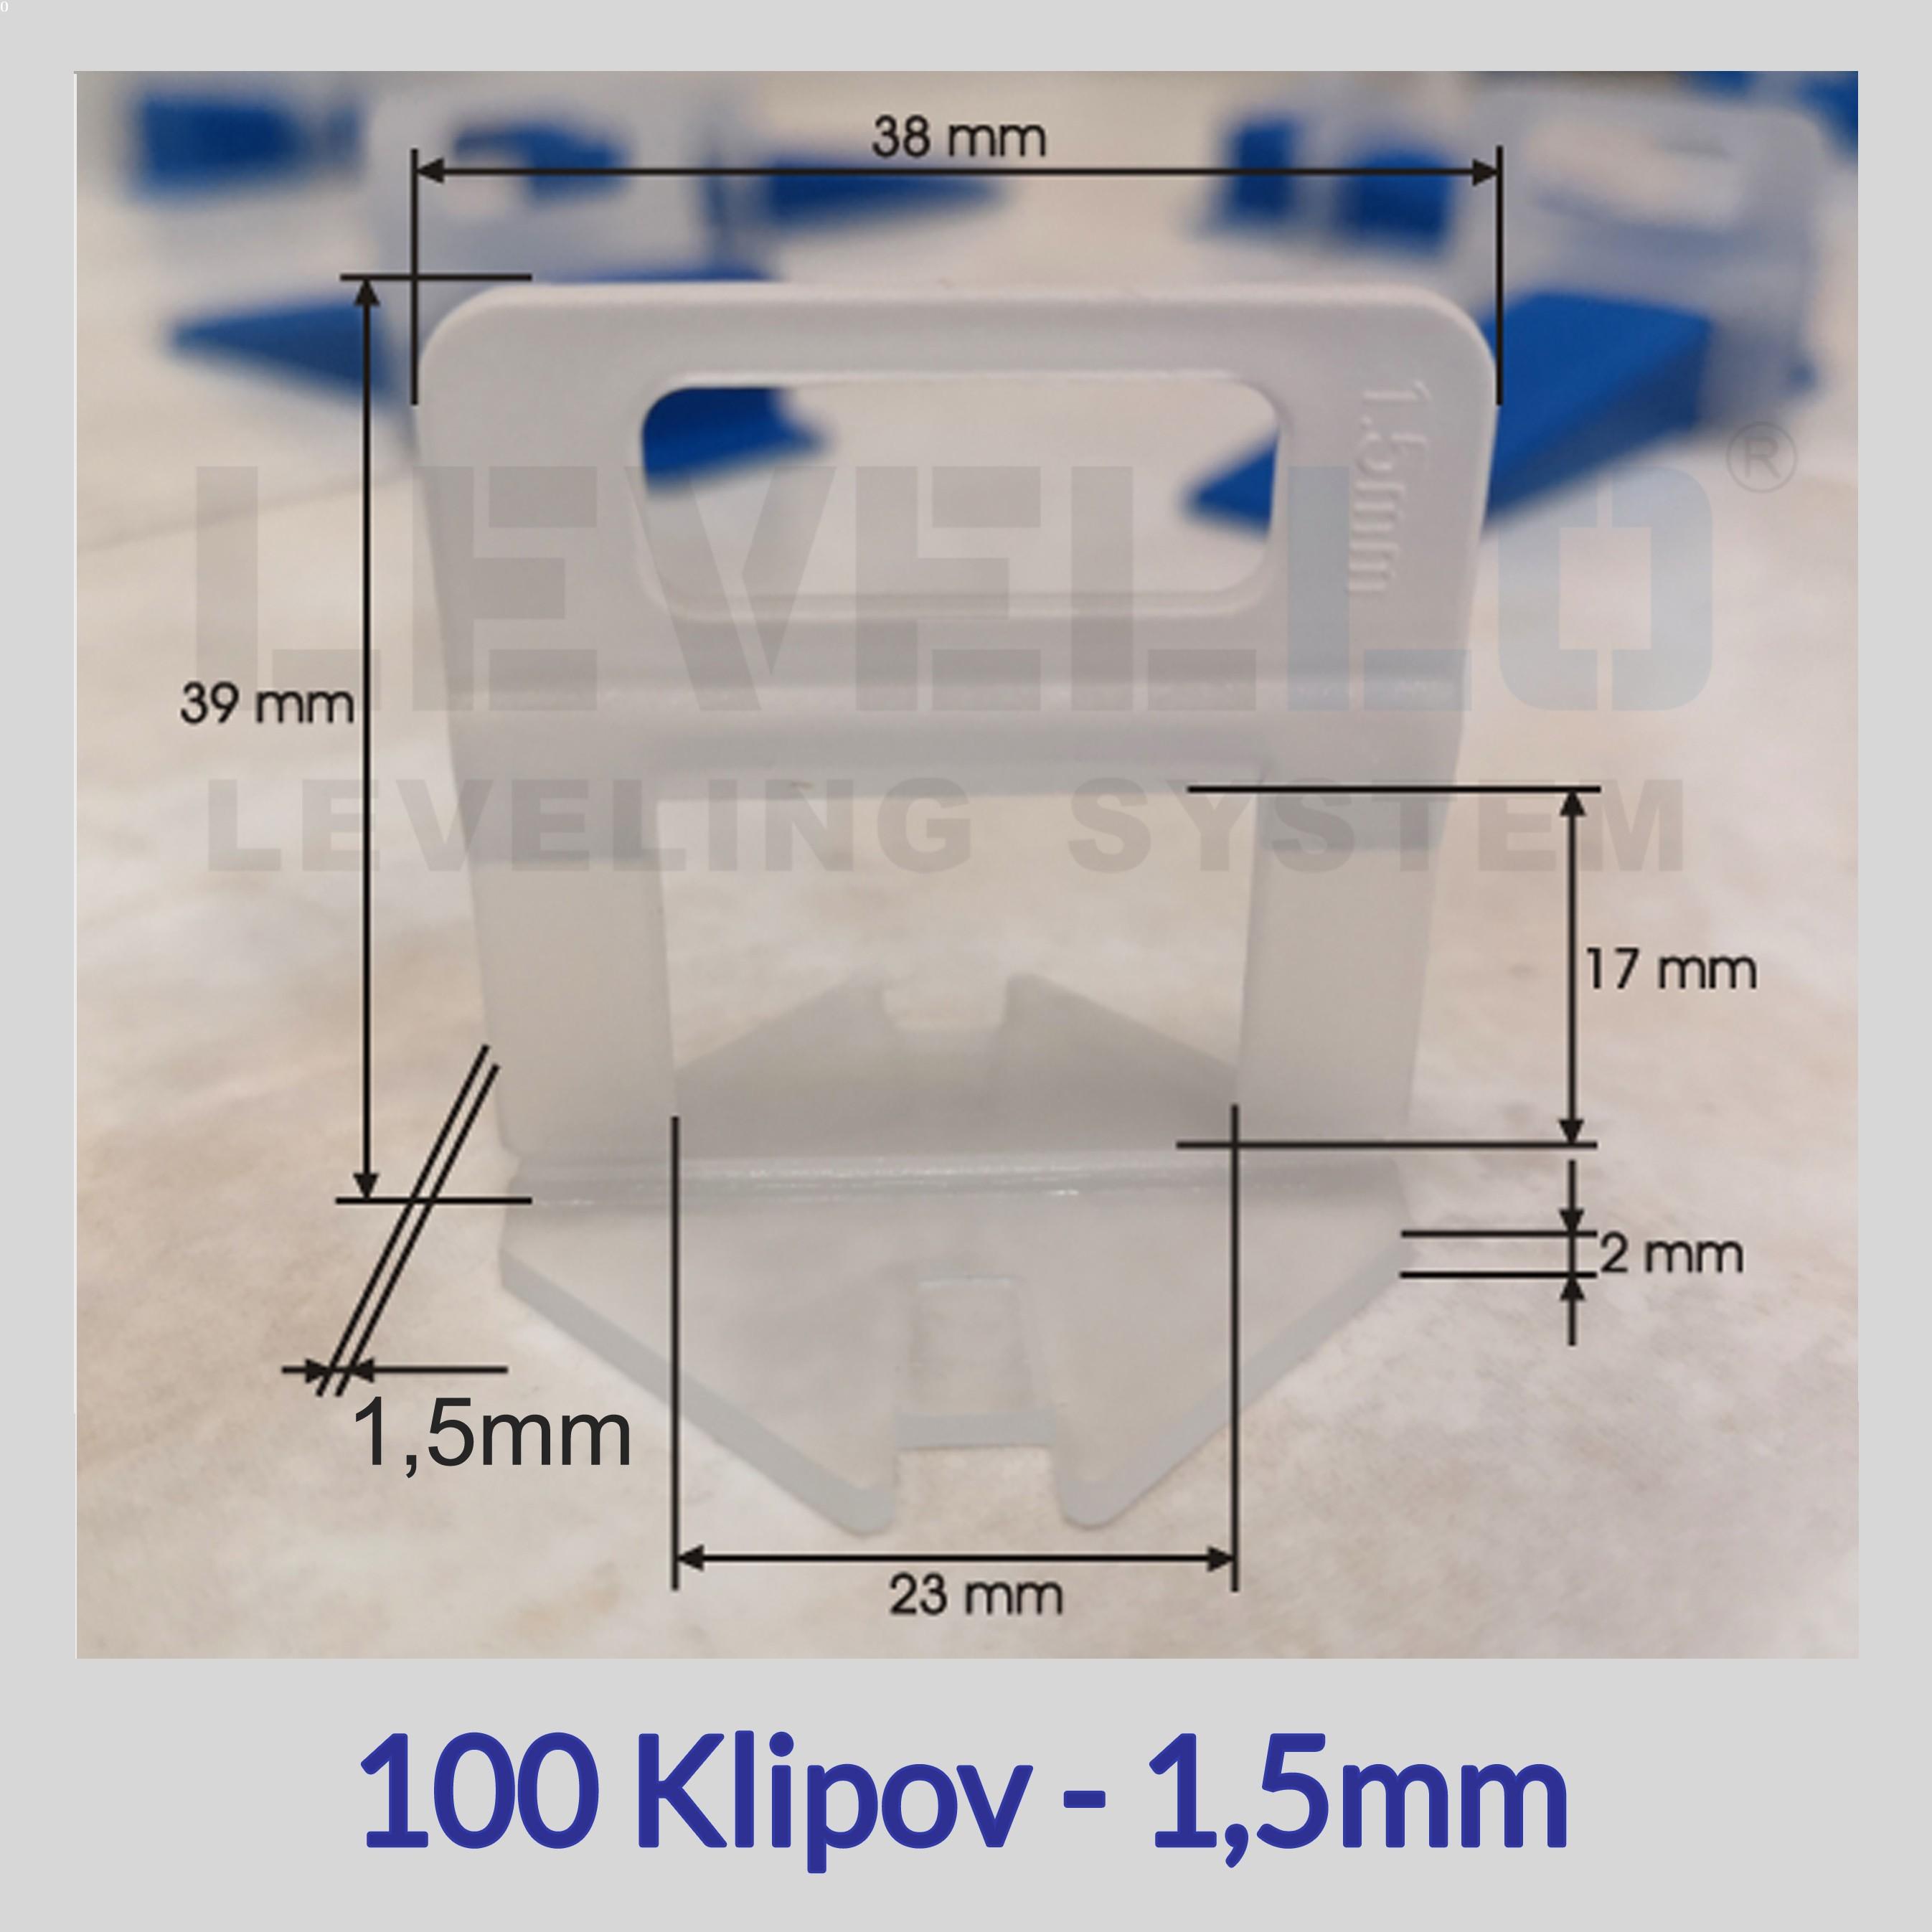 Klipy Eko LEVELLO ® 1,5 mm, 100 kusov